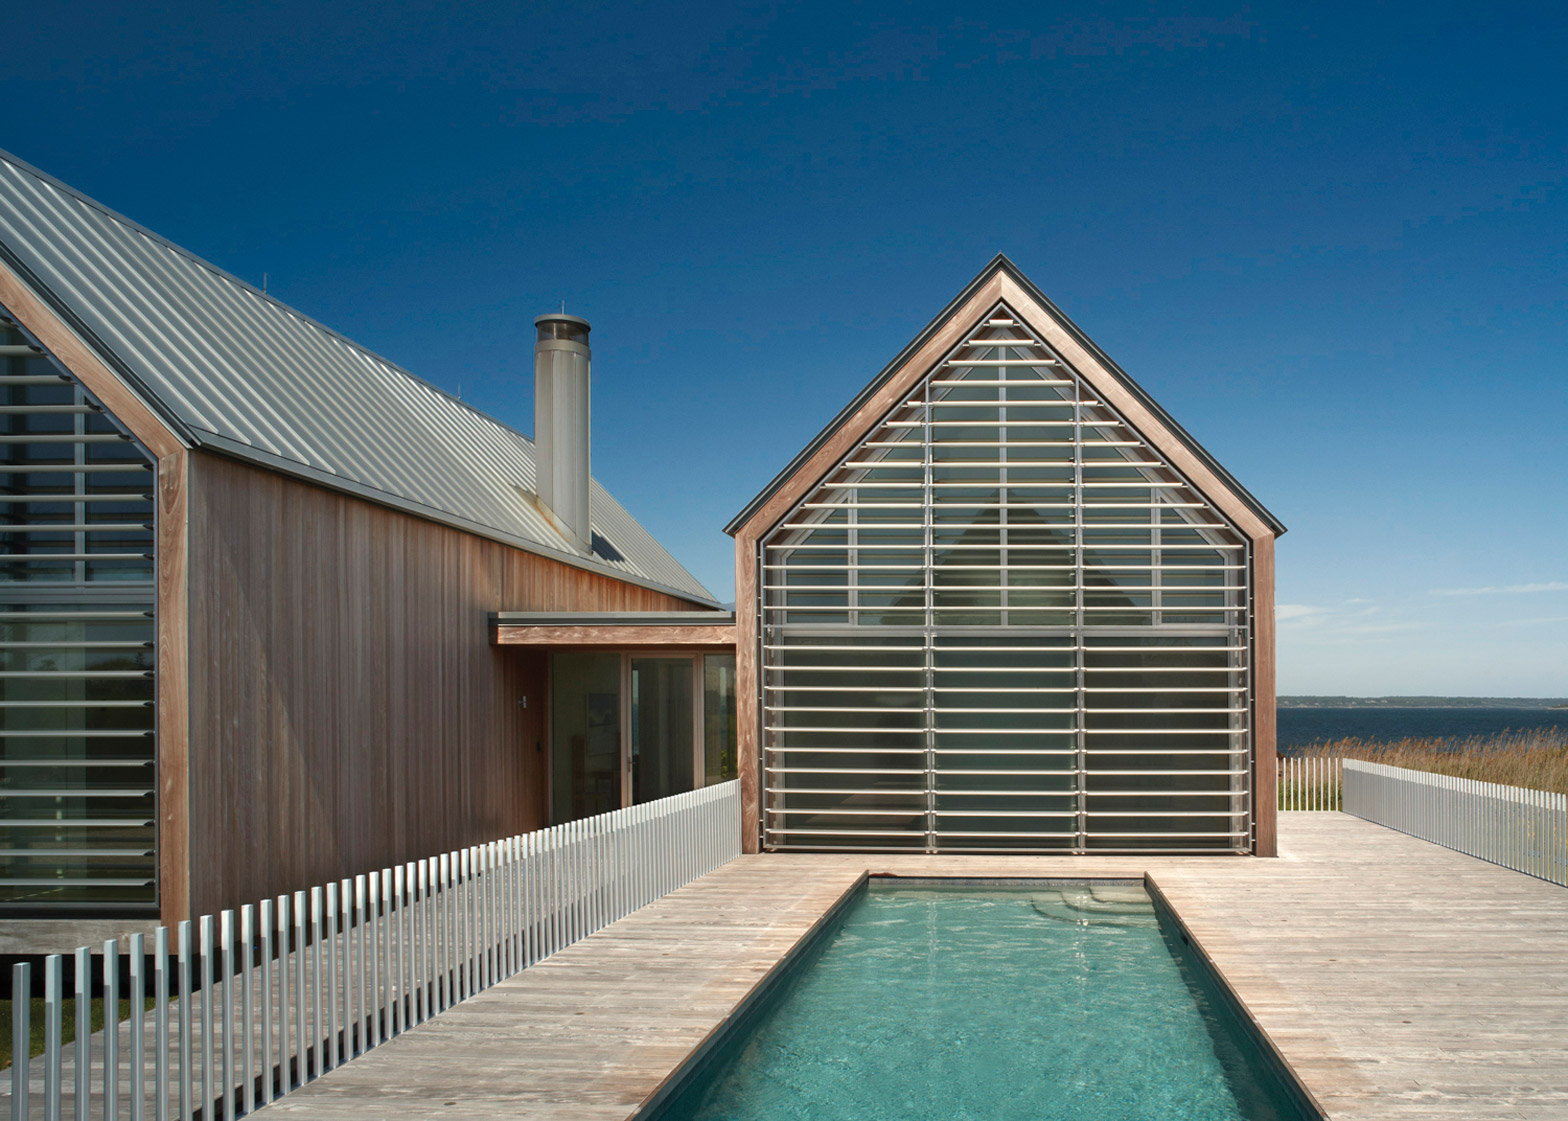 Ocean House by Roger Ferris + Partners